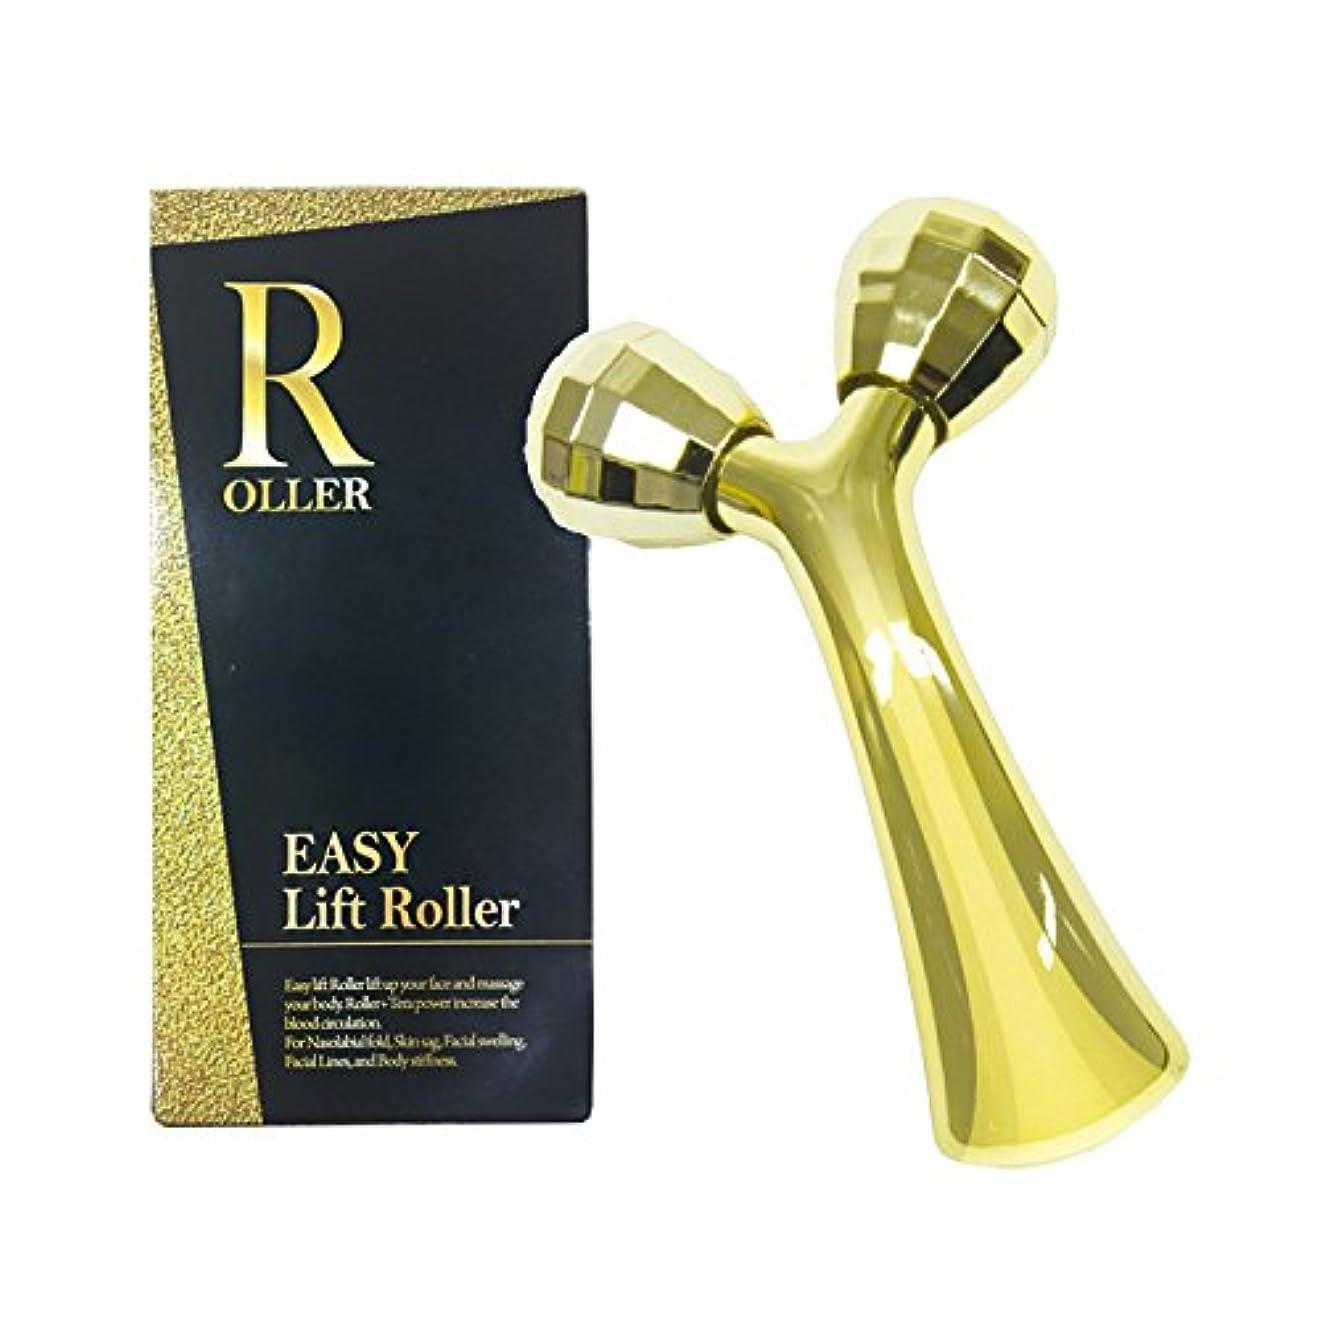 Easy Lift Roller(イージーリフトローラー)